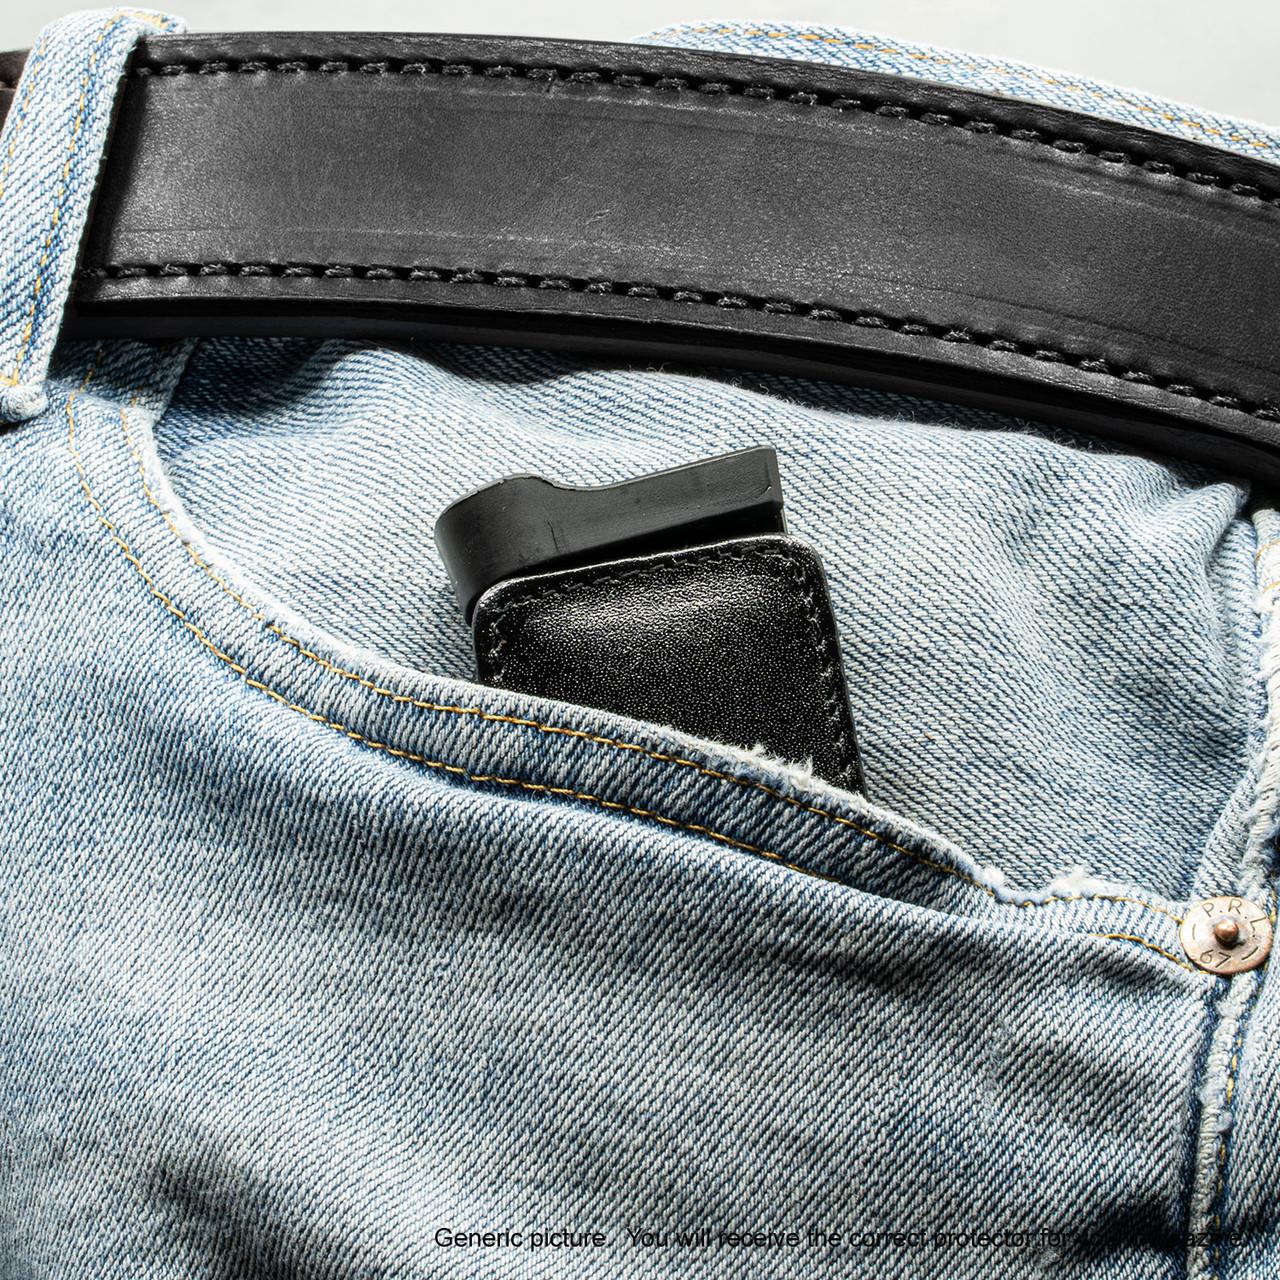 Kimber Evo Black Leather Magazine Pocket Protector